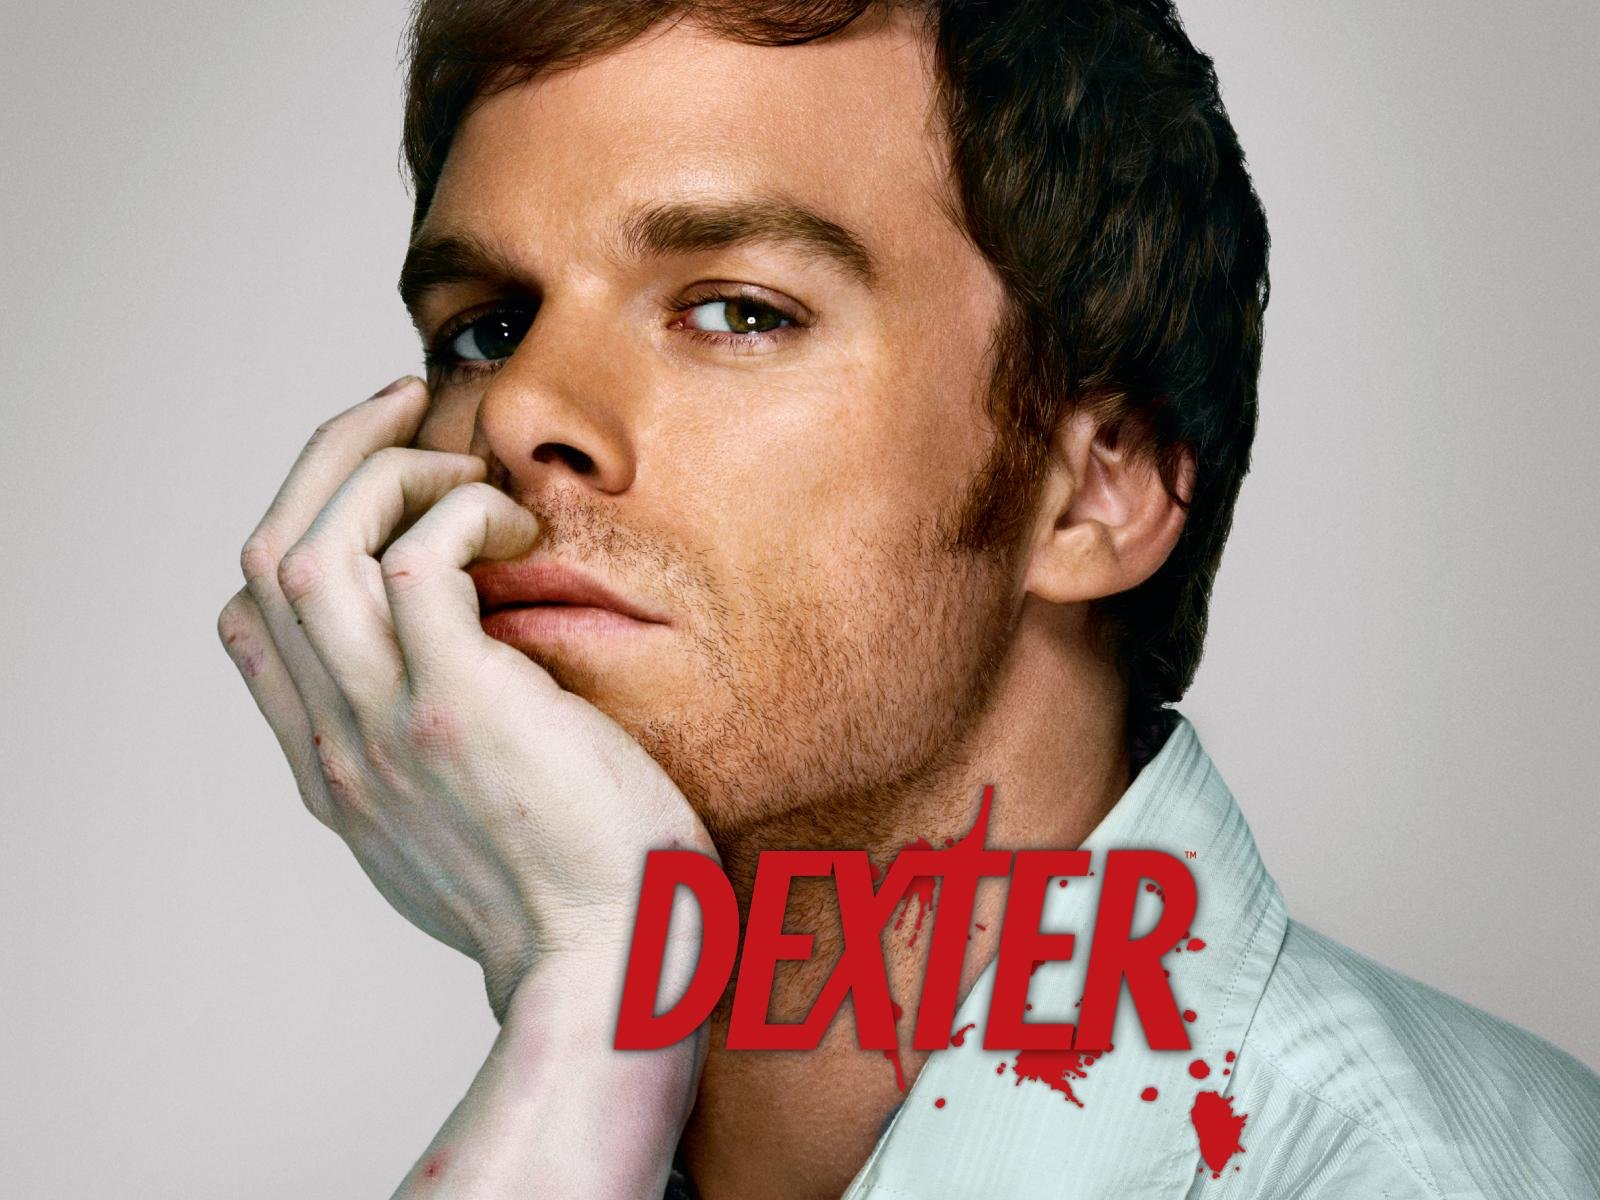 dexter season 8 episode 2 download